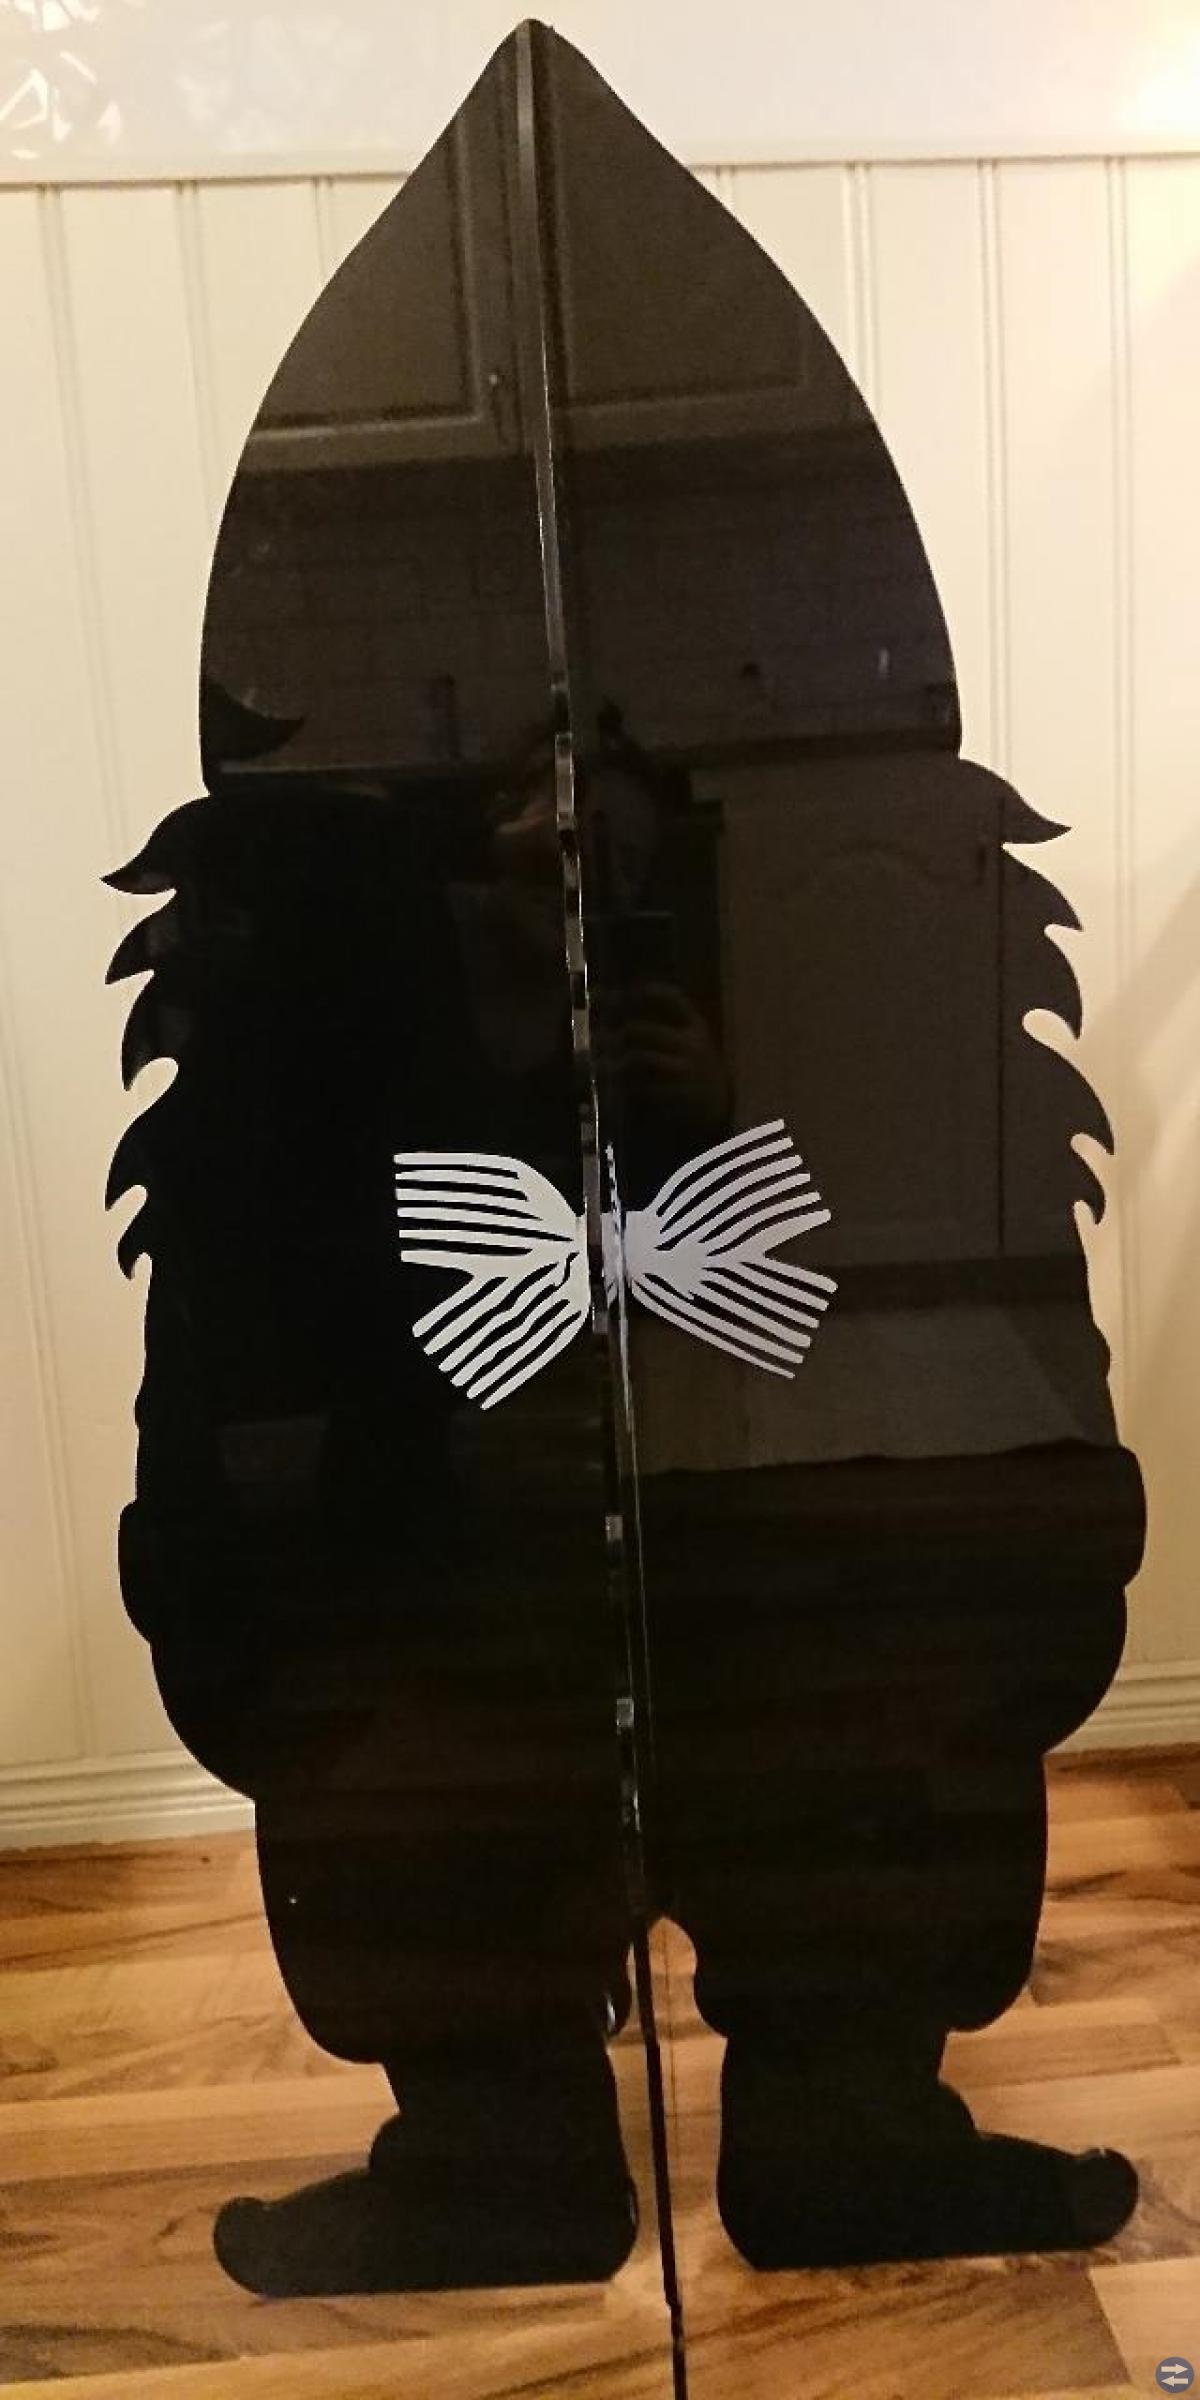 Tomte Svart i plastik.104cm hög.